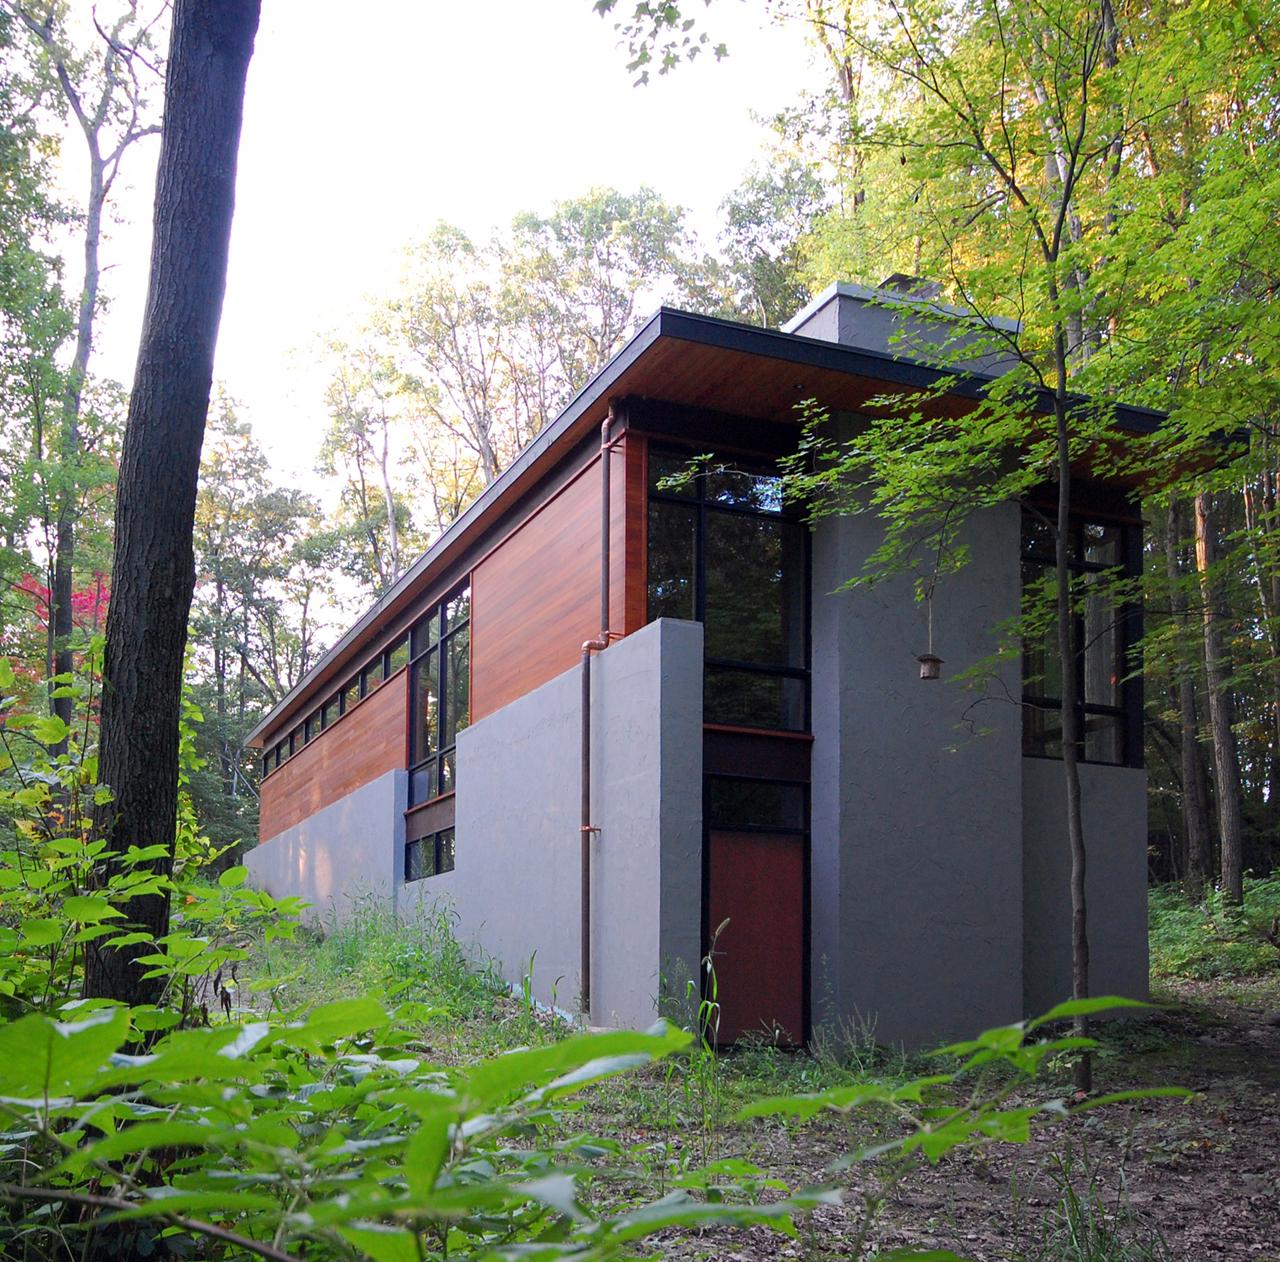 Bluff House / Bruns Architecture, Courtesy of Bruns Architecture